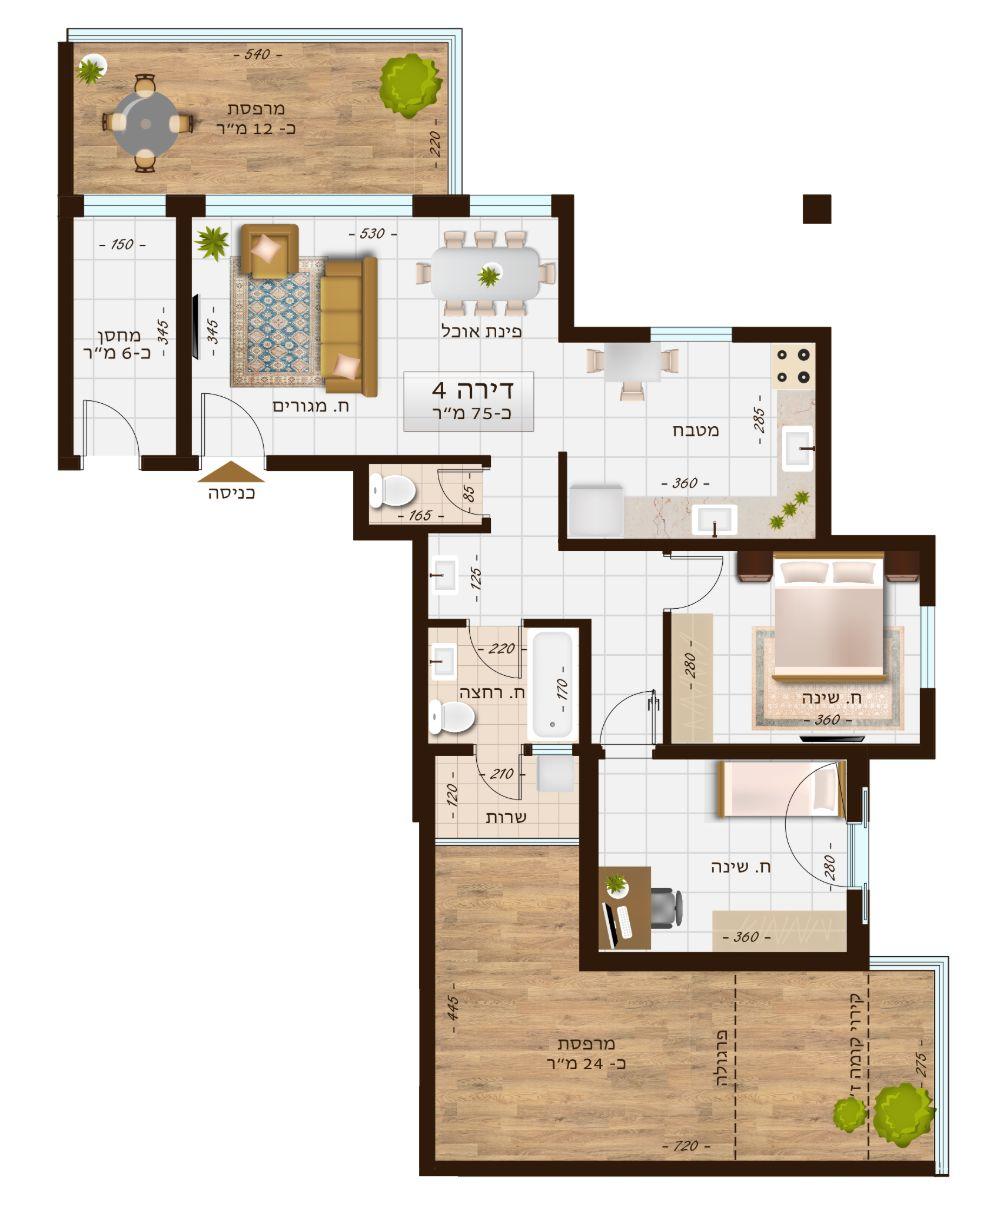 בניין 1106 דירה 4